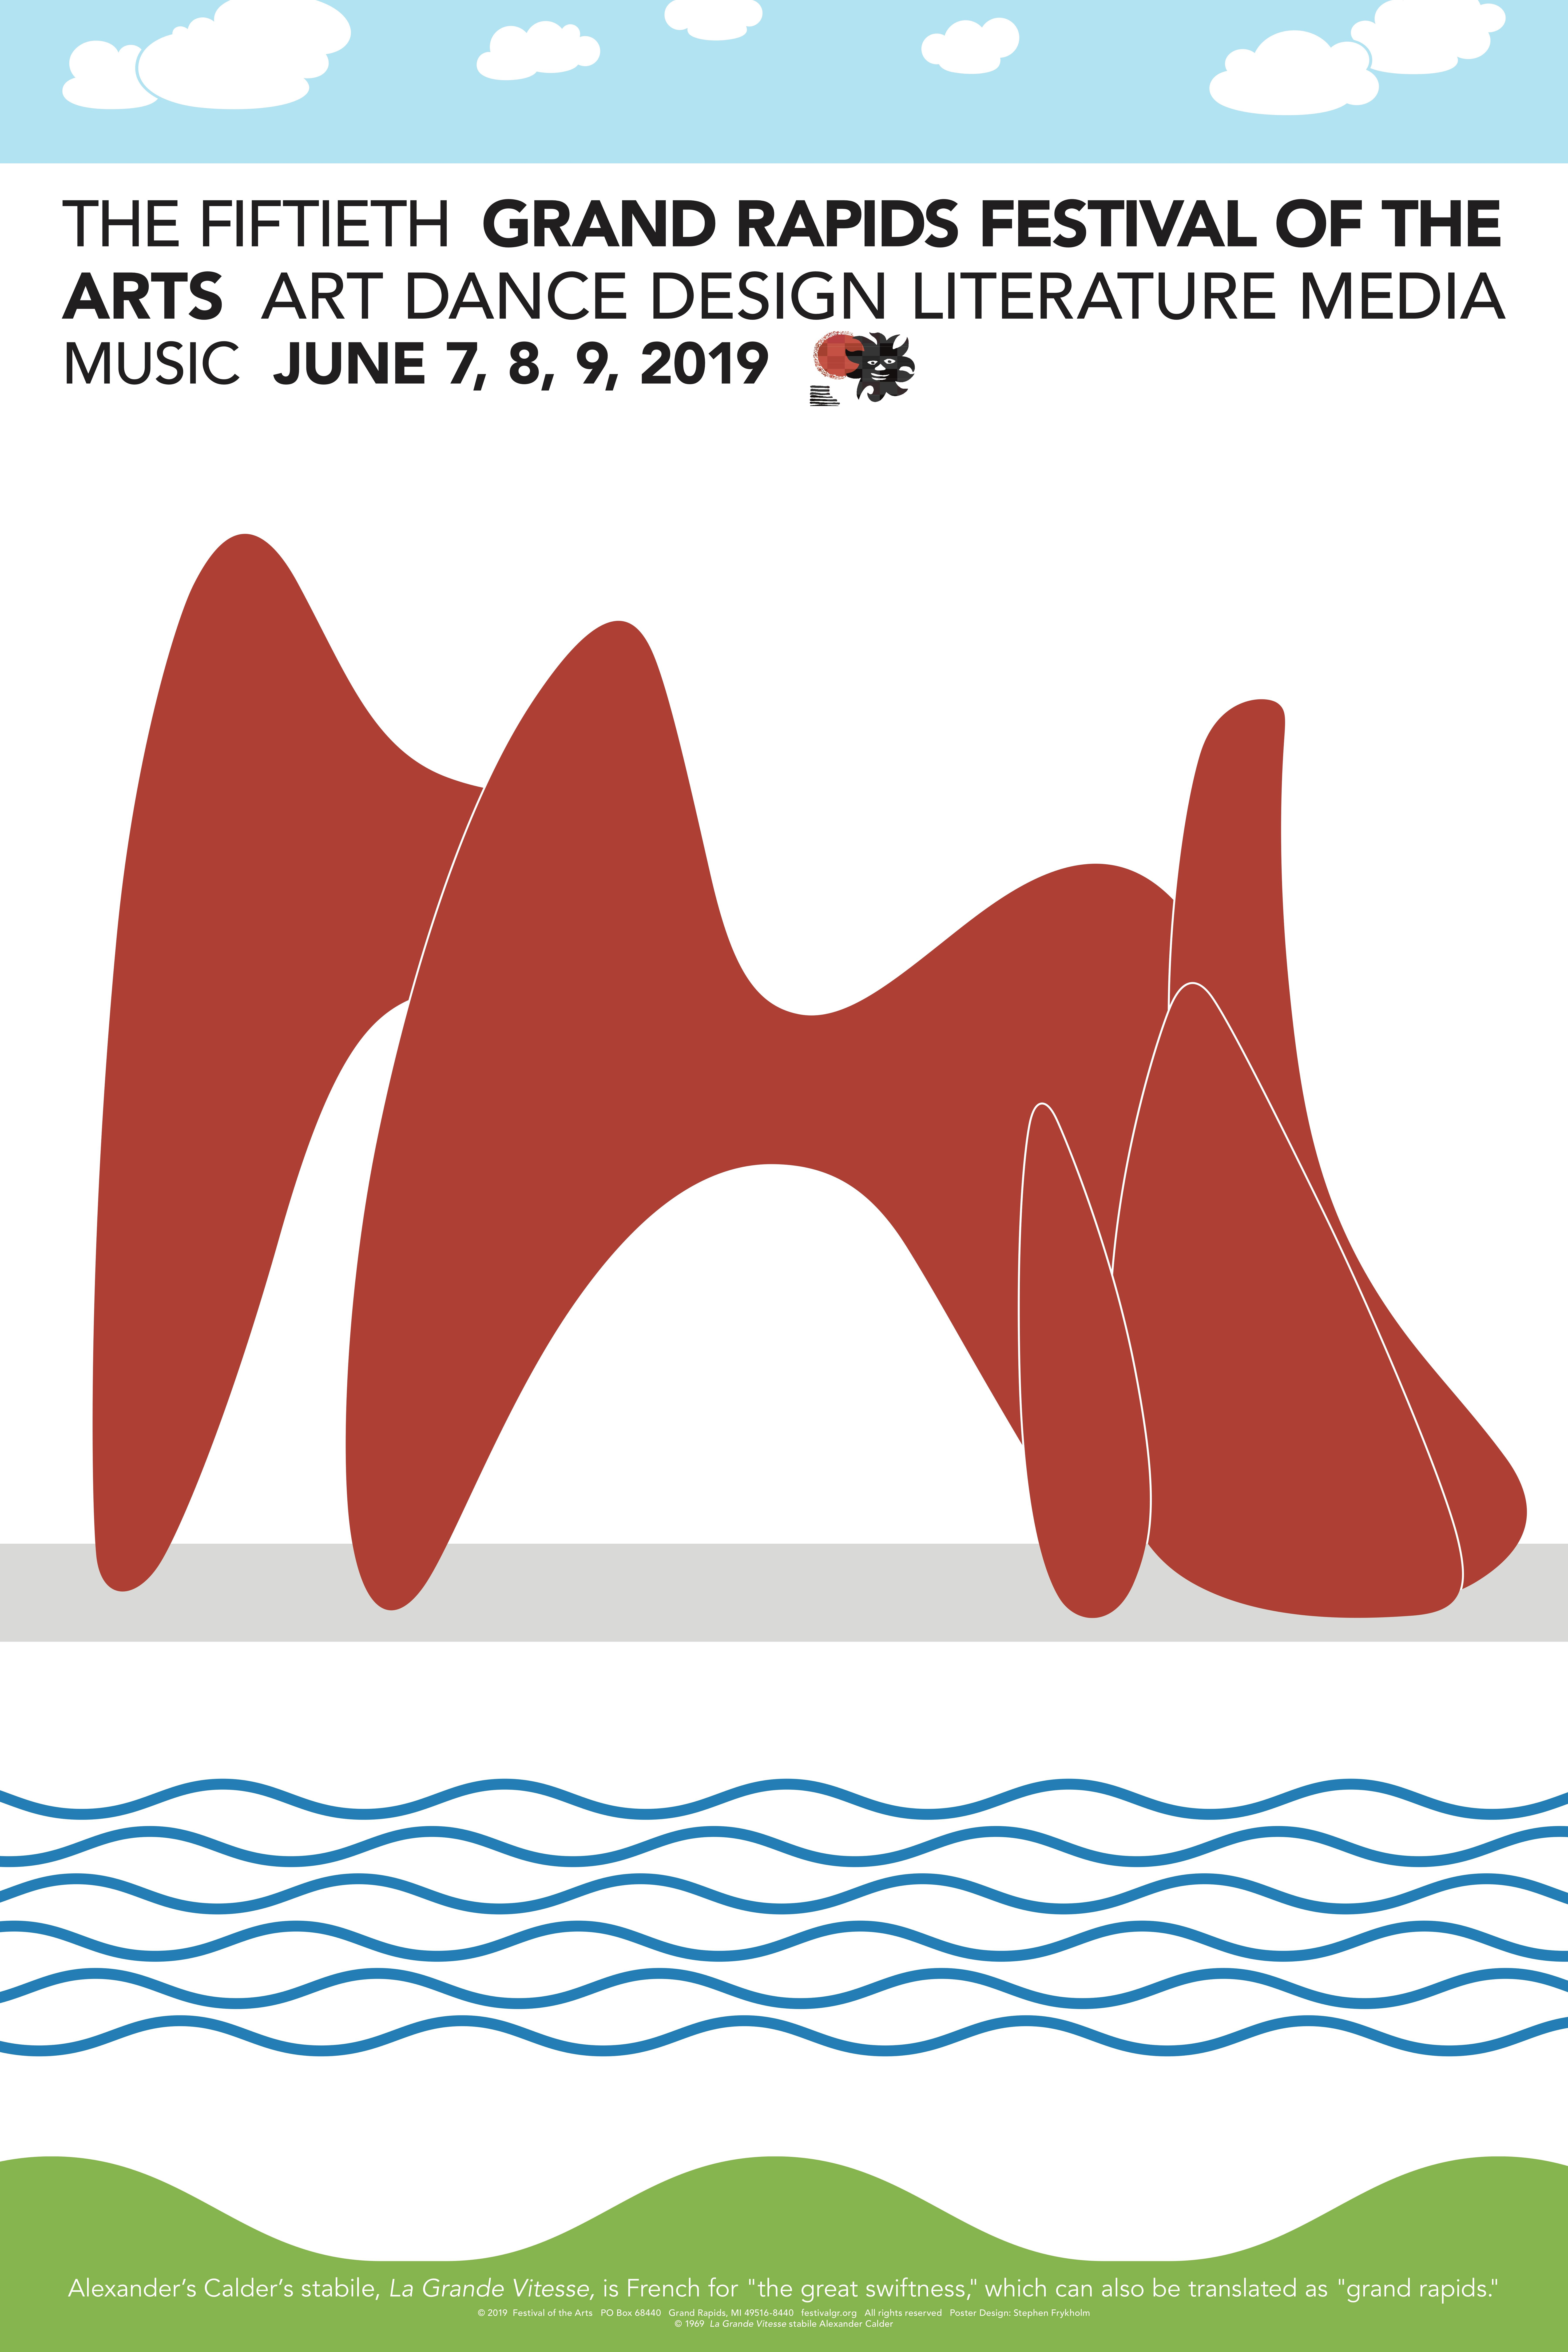 50th Celebration poster commemorates  Calder's La Grande Vitesse